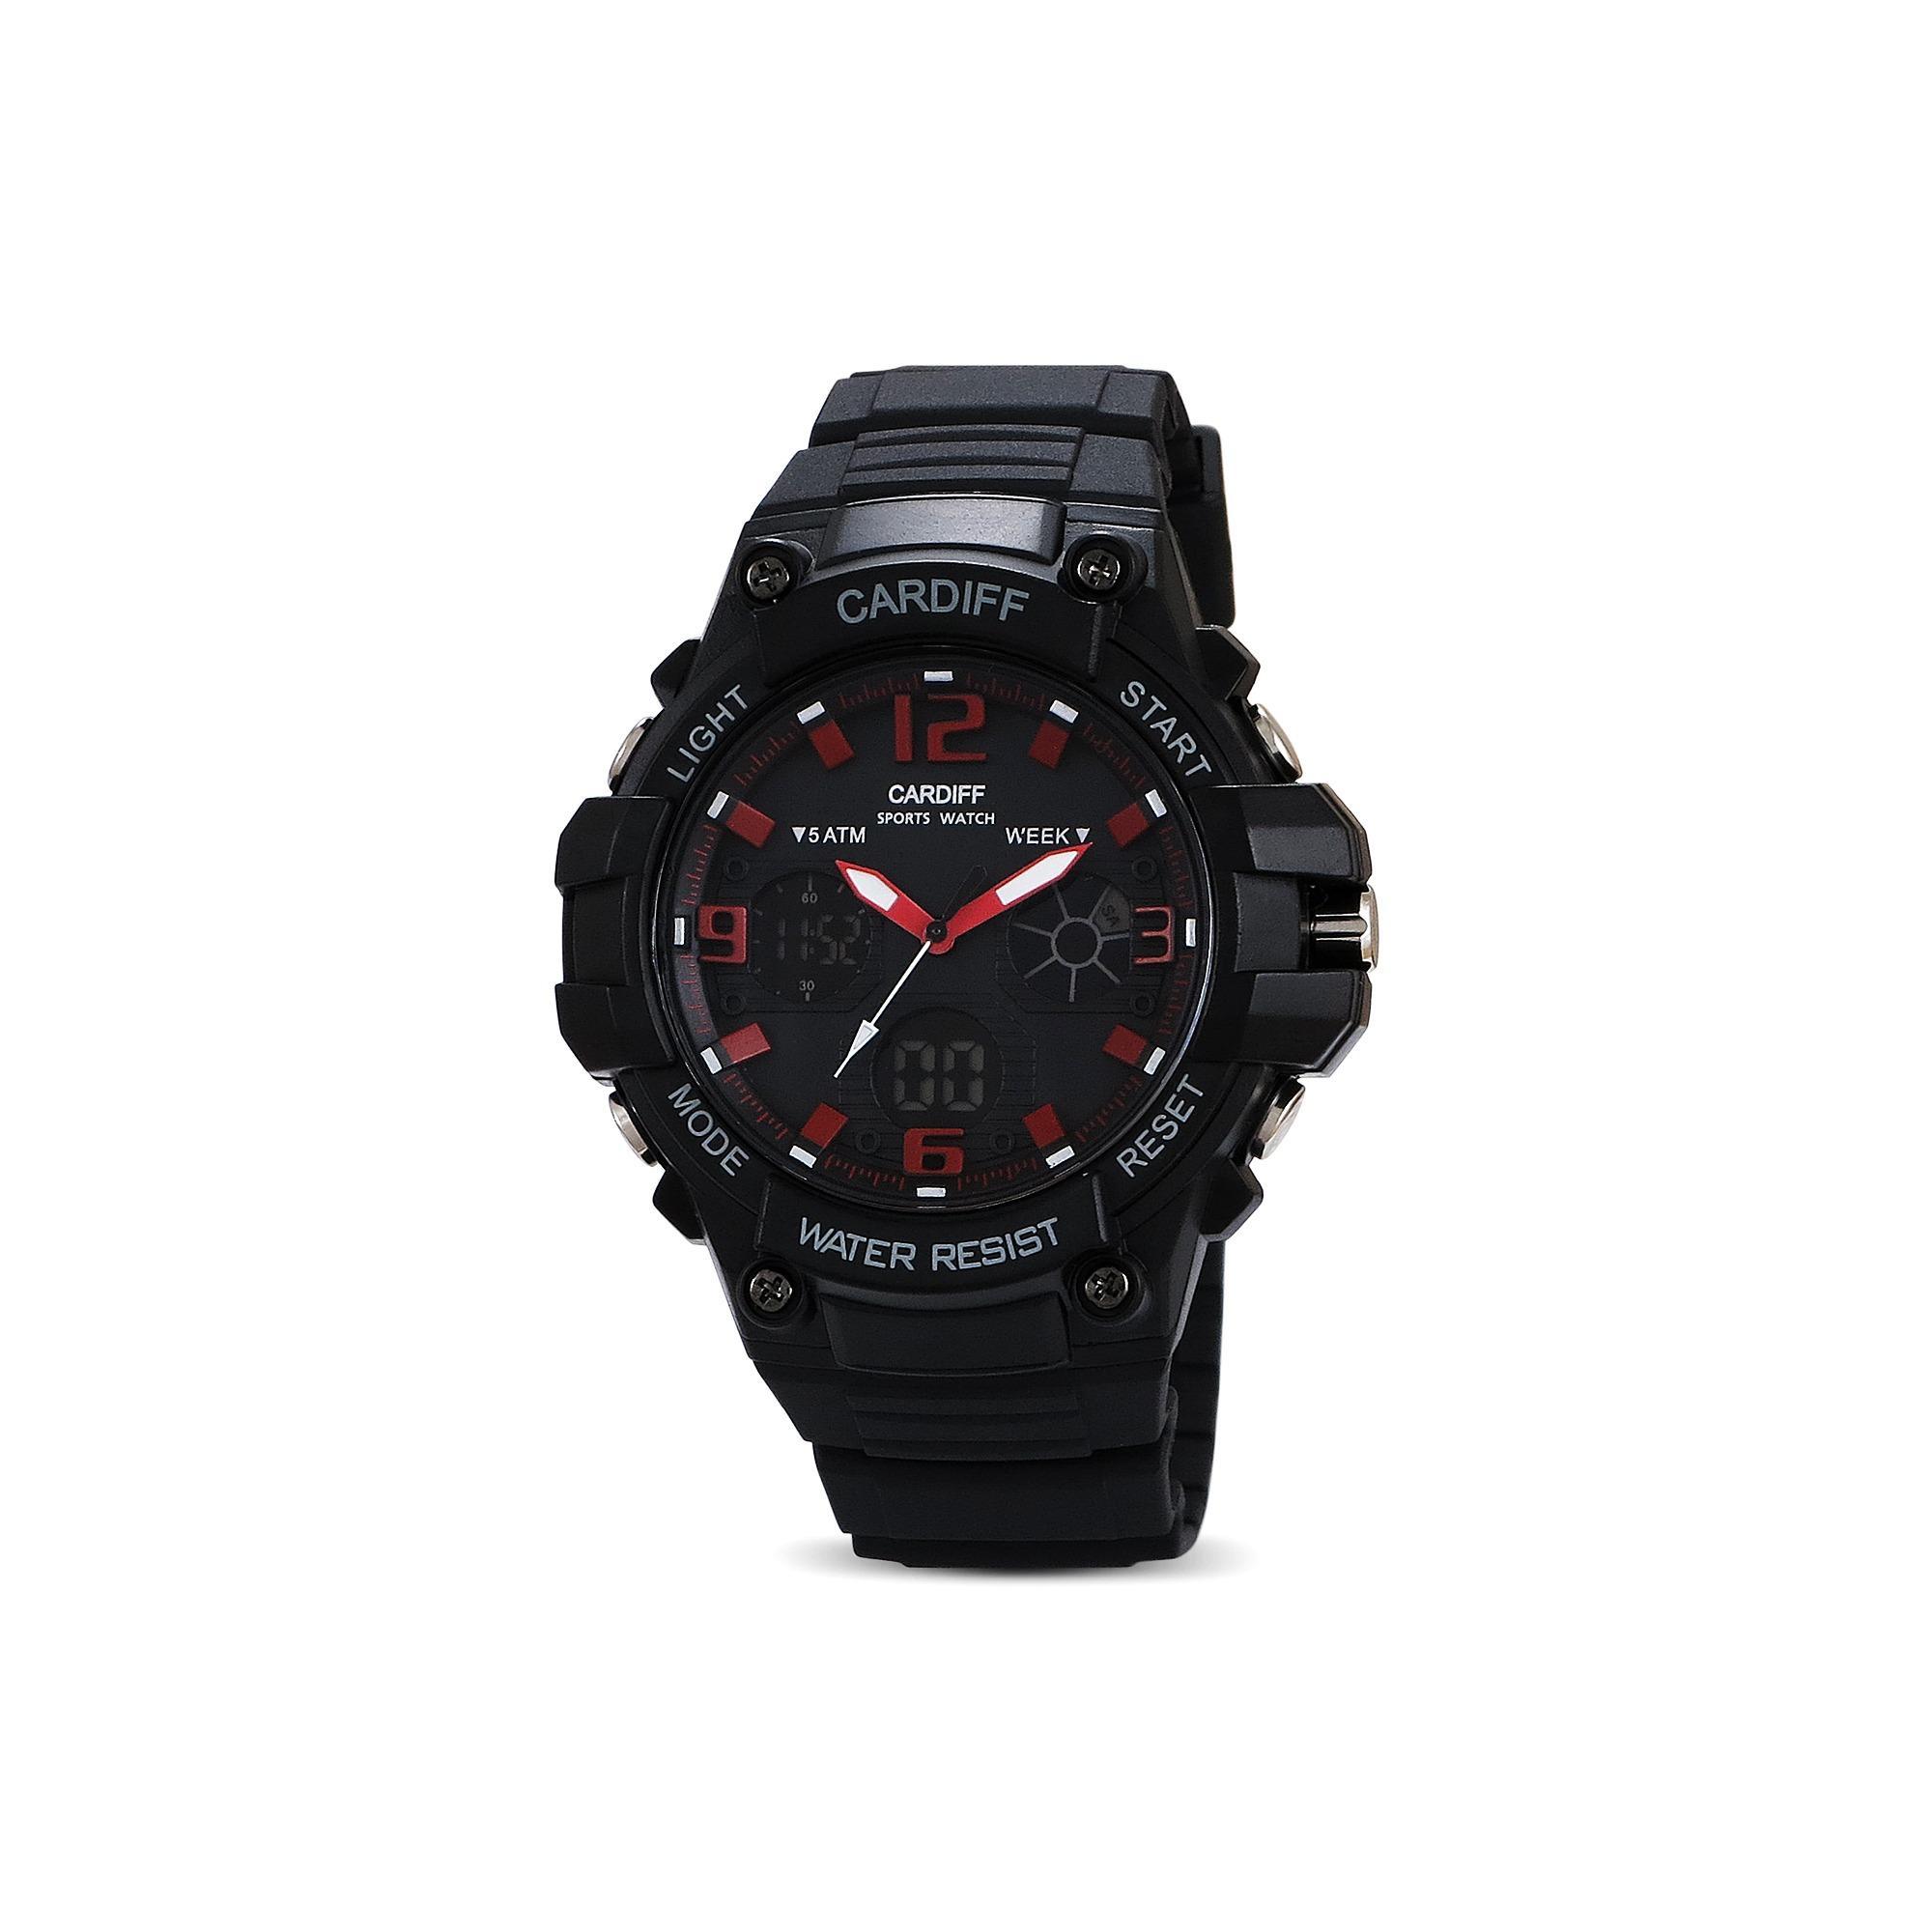 Jam Tangan Double Time CARDIFF ORIGINAL DT 6015 Red Berkualitas Water Resistance Garansi 1 Tahun